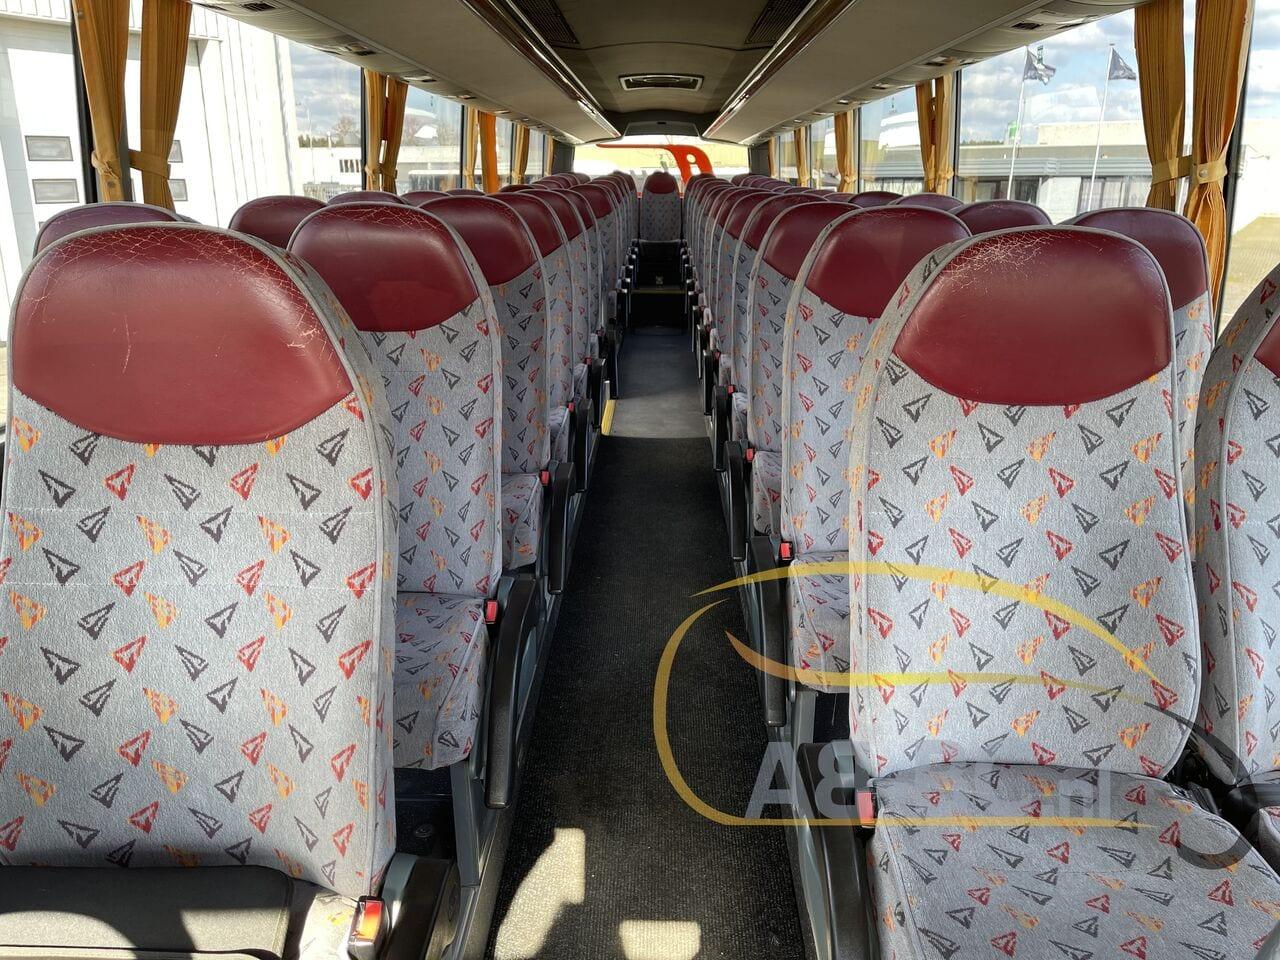 coach-busTEMSA-Safari-RD-53-Seats-DAF-Motor-12-mtr---1616166767780376919_big_e18b0f4fb812ceed40cdd297b5c07ef7--21031917053743807500